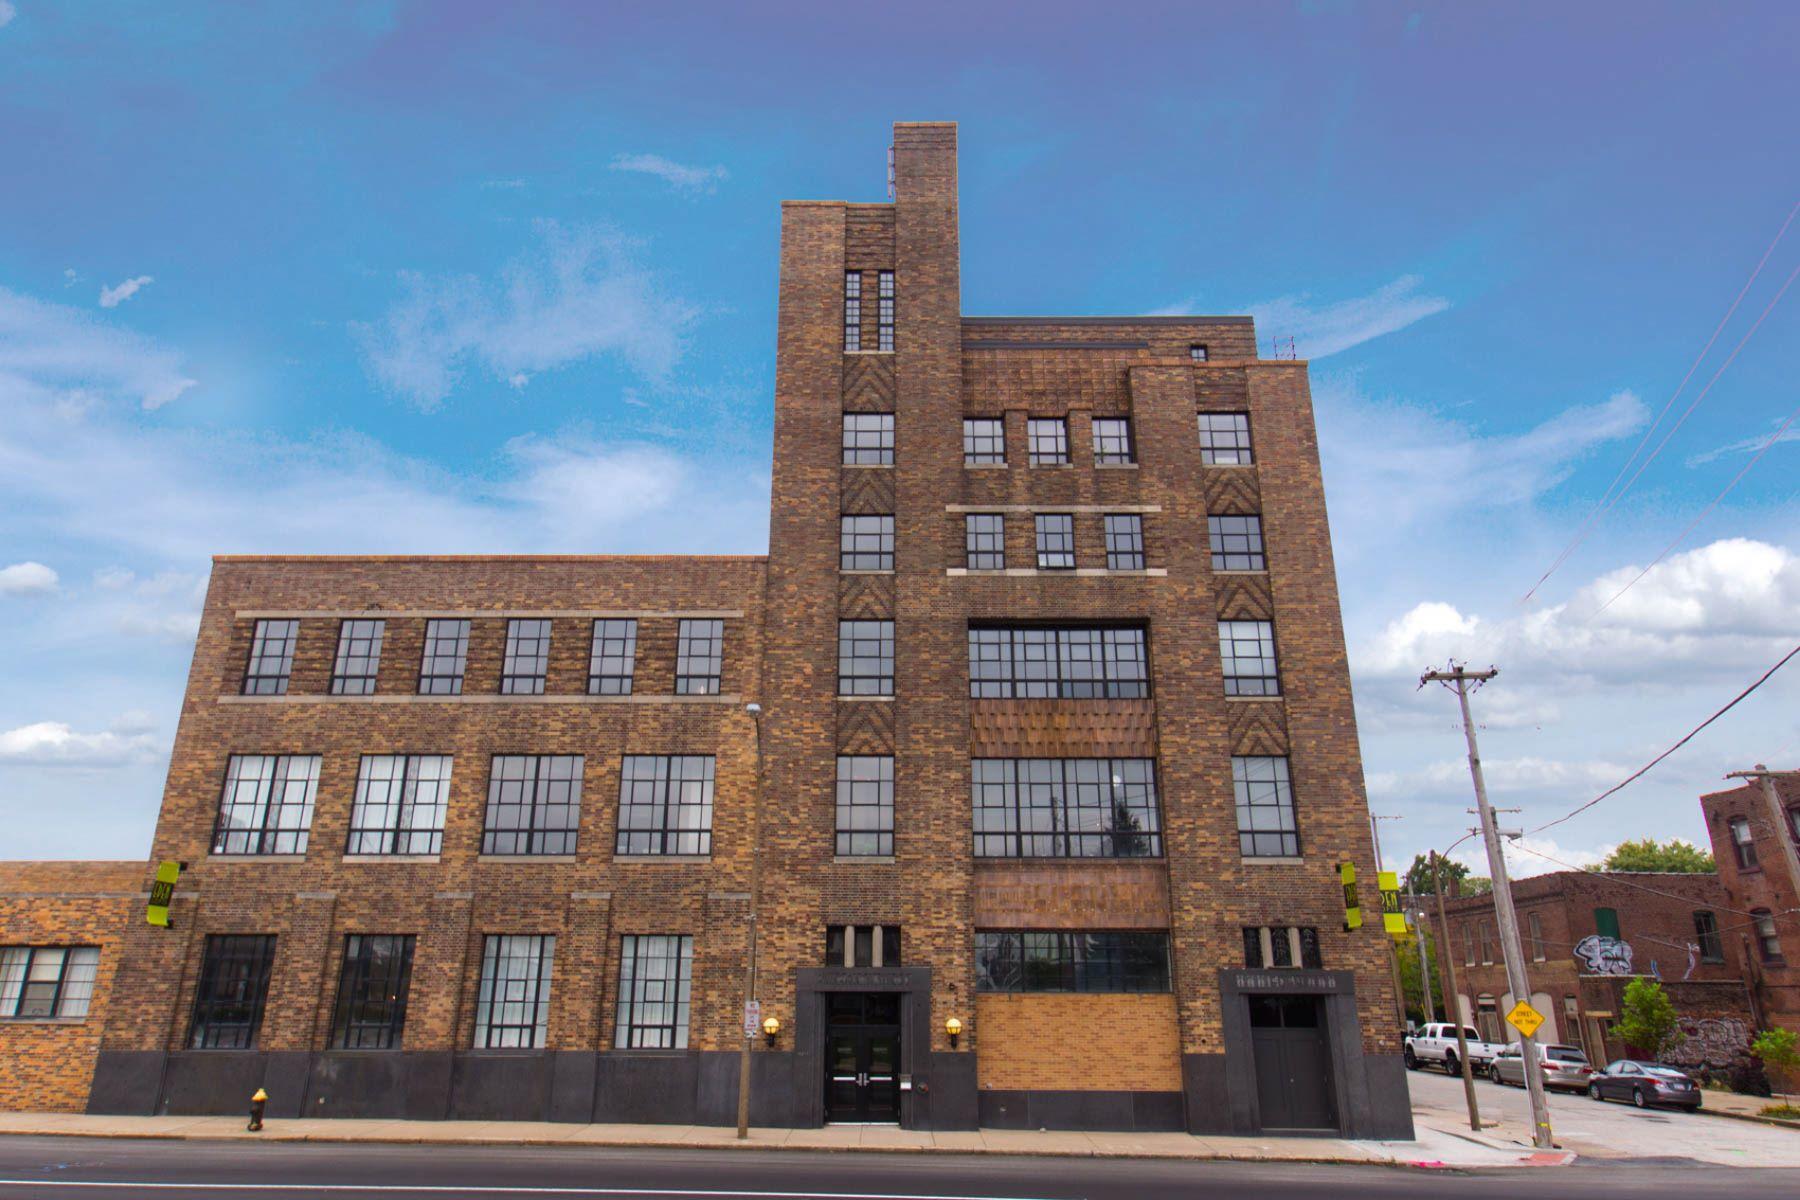 Condominium for Sale at Chouteau Ave #204 1720 Chouteau Ave # 204 St. Louis, Missouri 63103 United States